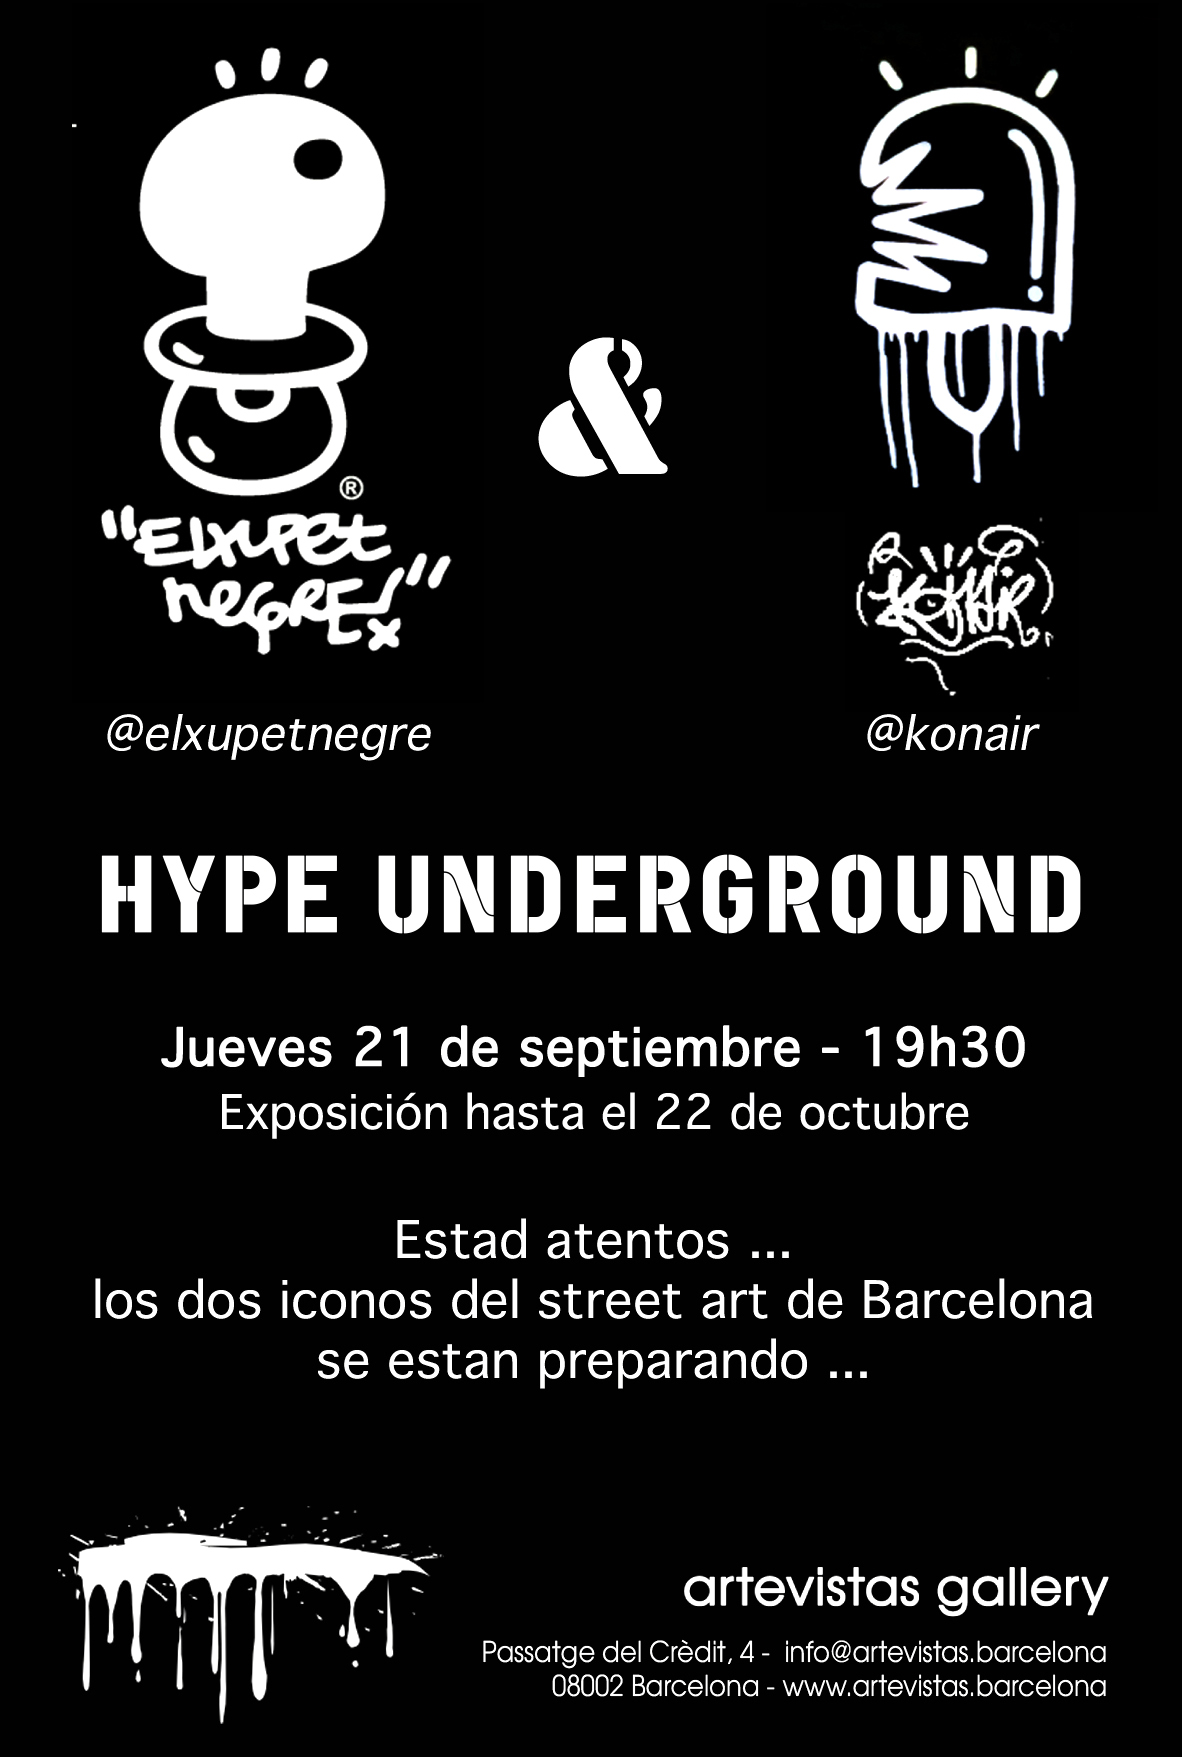 Hype Underground - El Xupet Negre & Konair